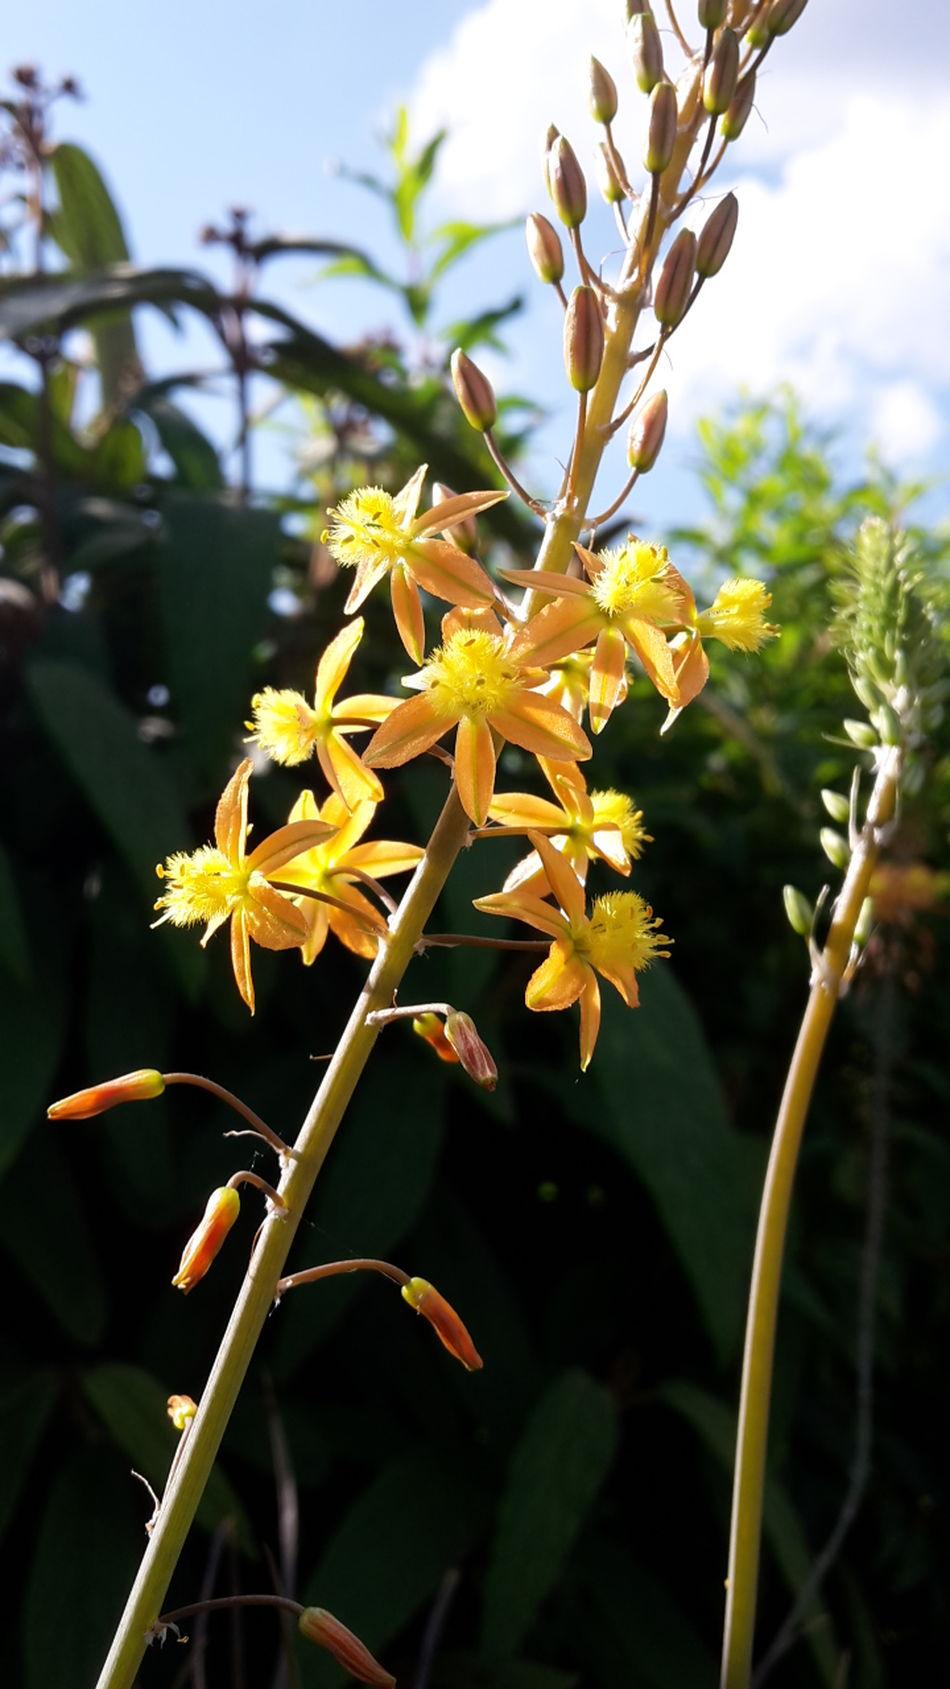 Bulbine Frutescens Medicuspflanze Nahaufnahme 43 Golden Moments